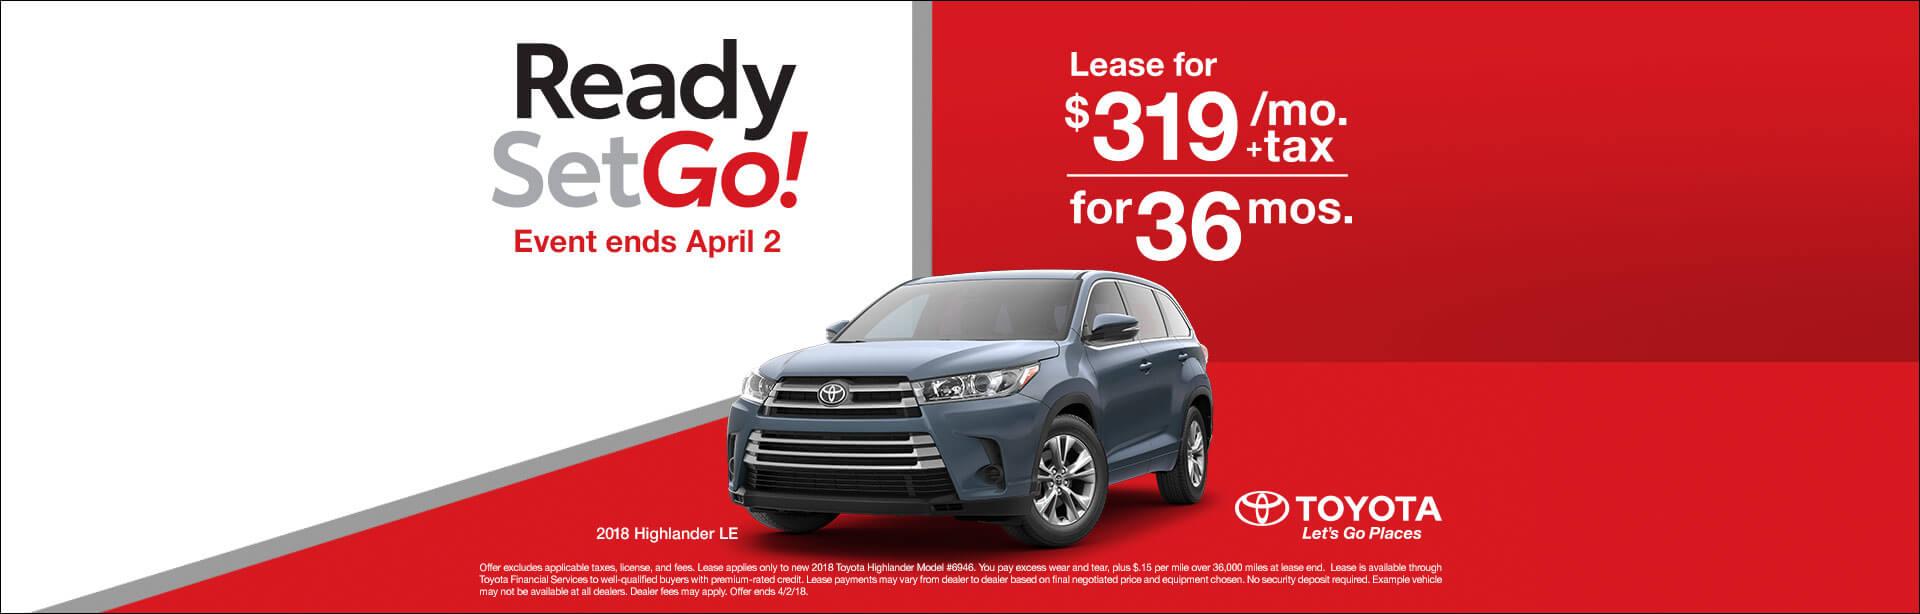 Toyota Highlander Lease Offer March 2018